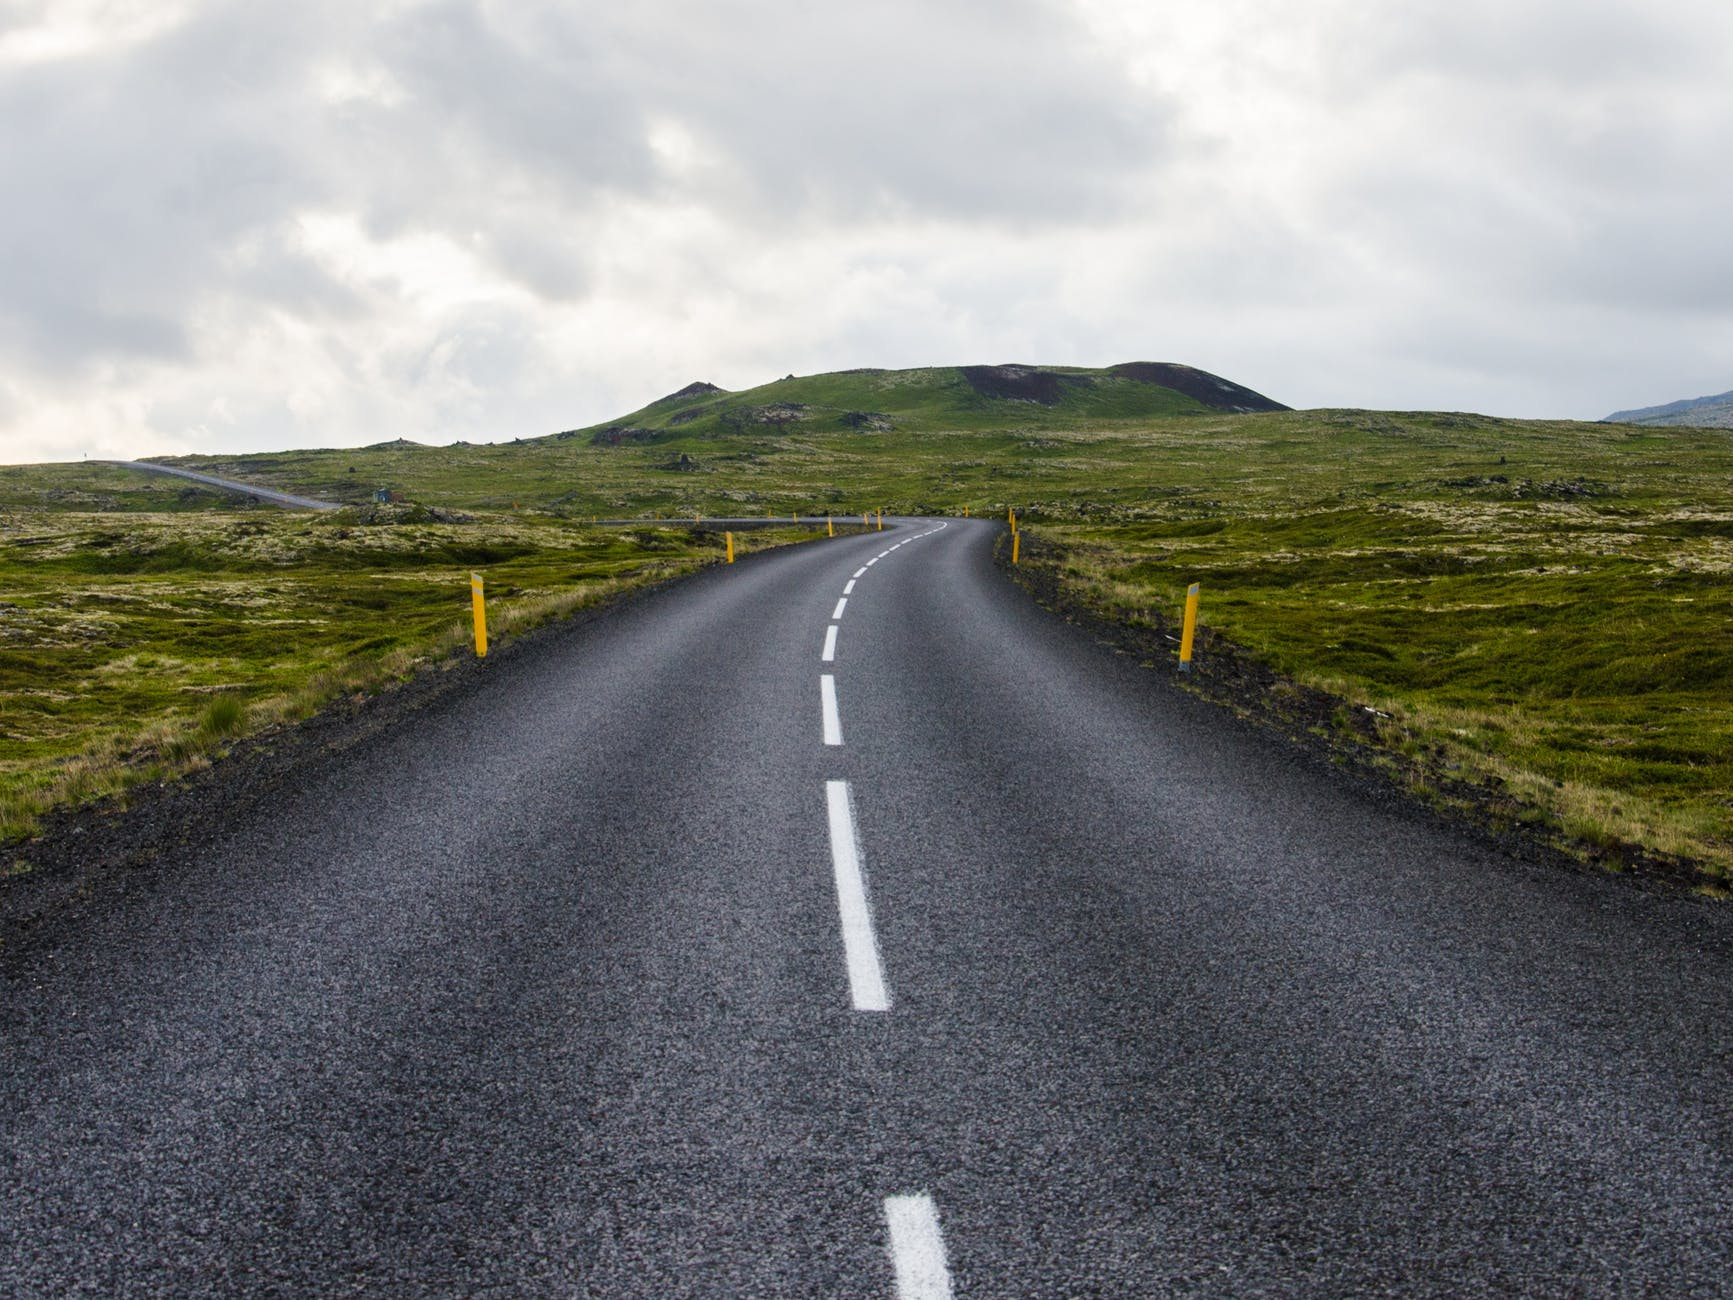 adventure asphalt clouds country